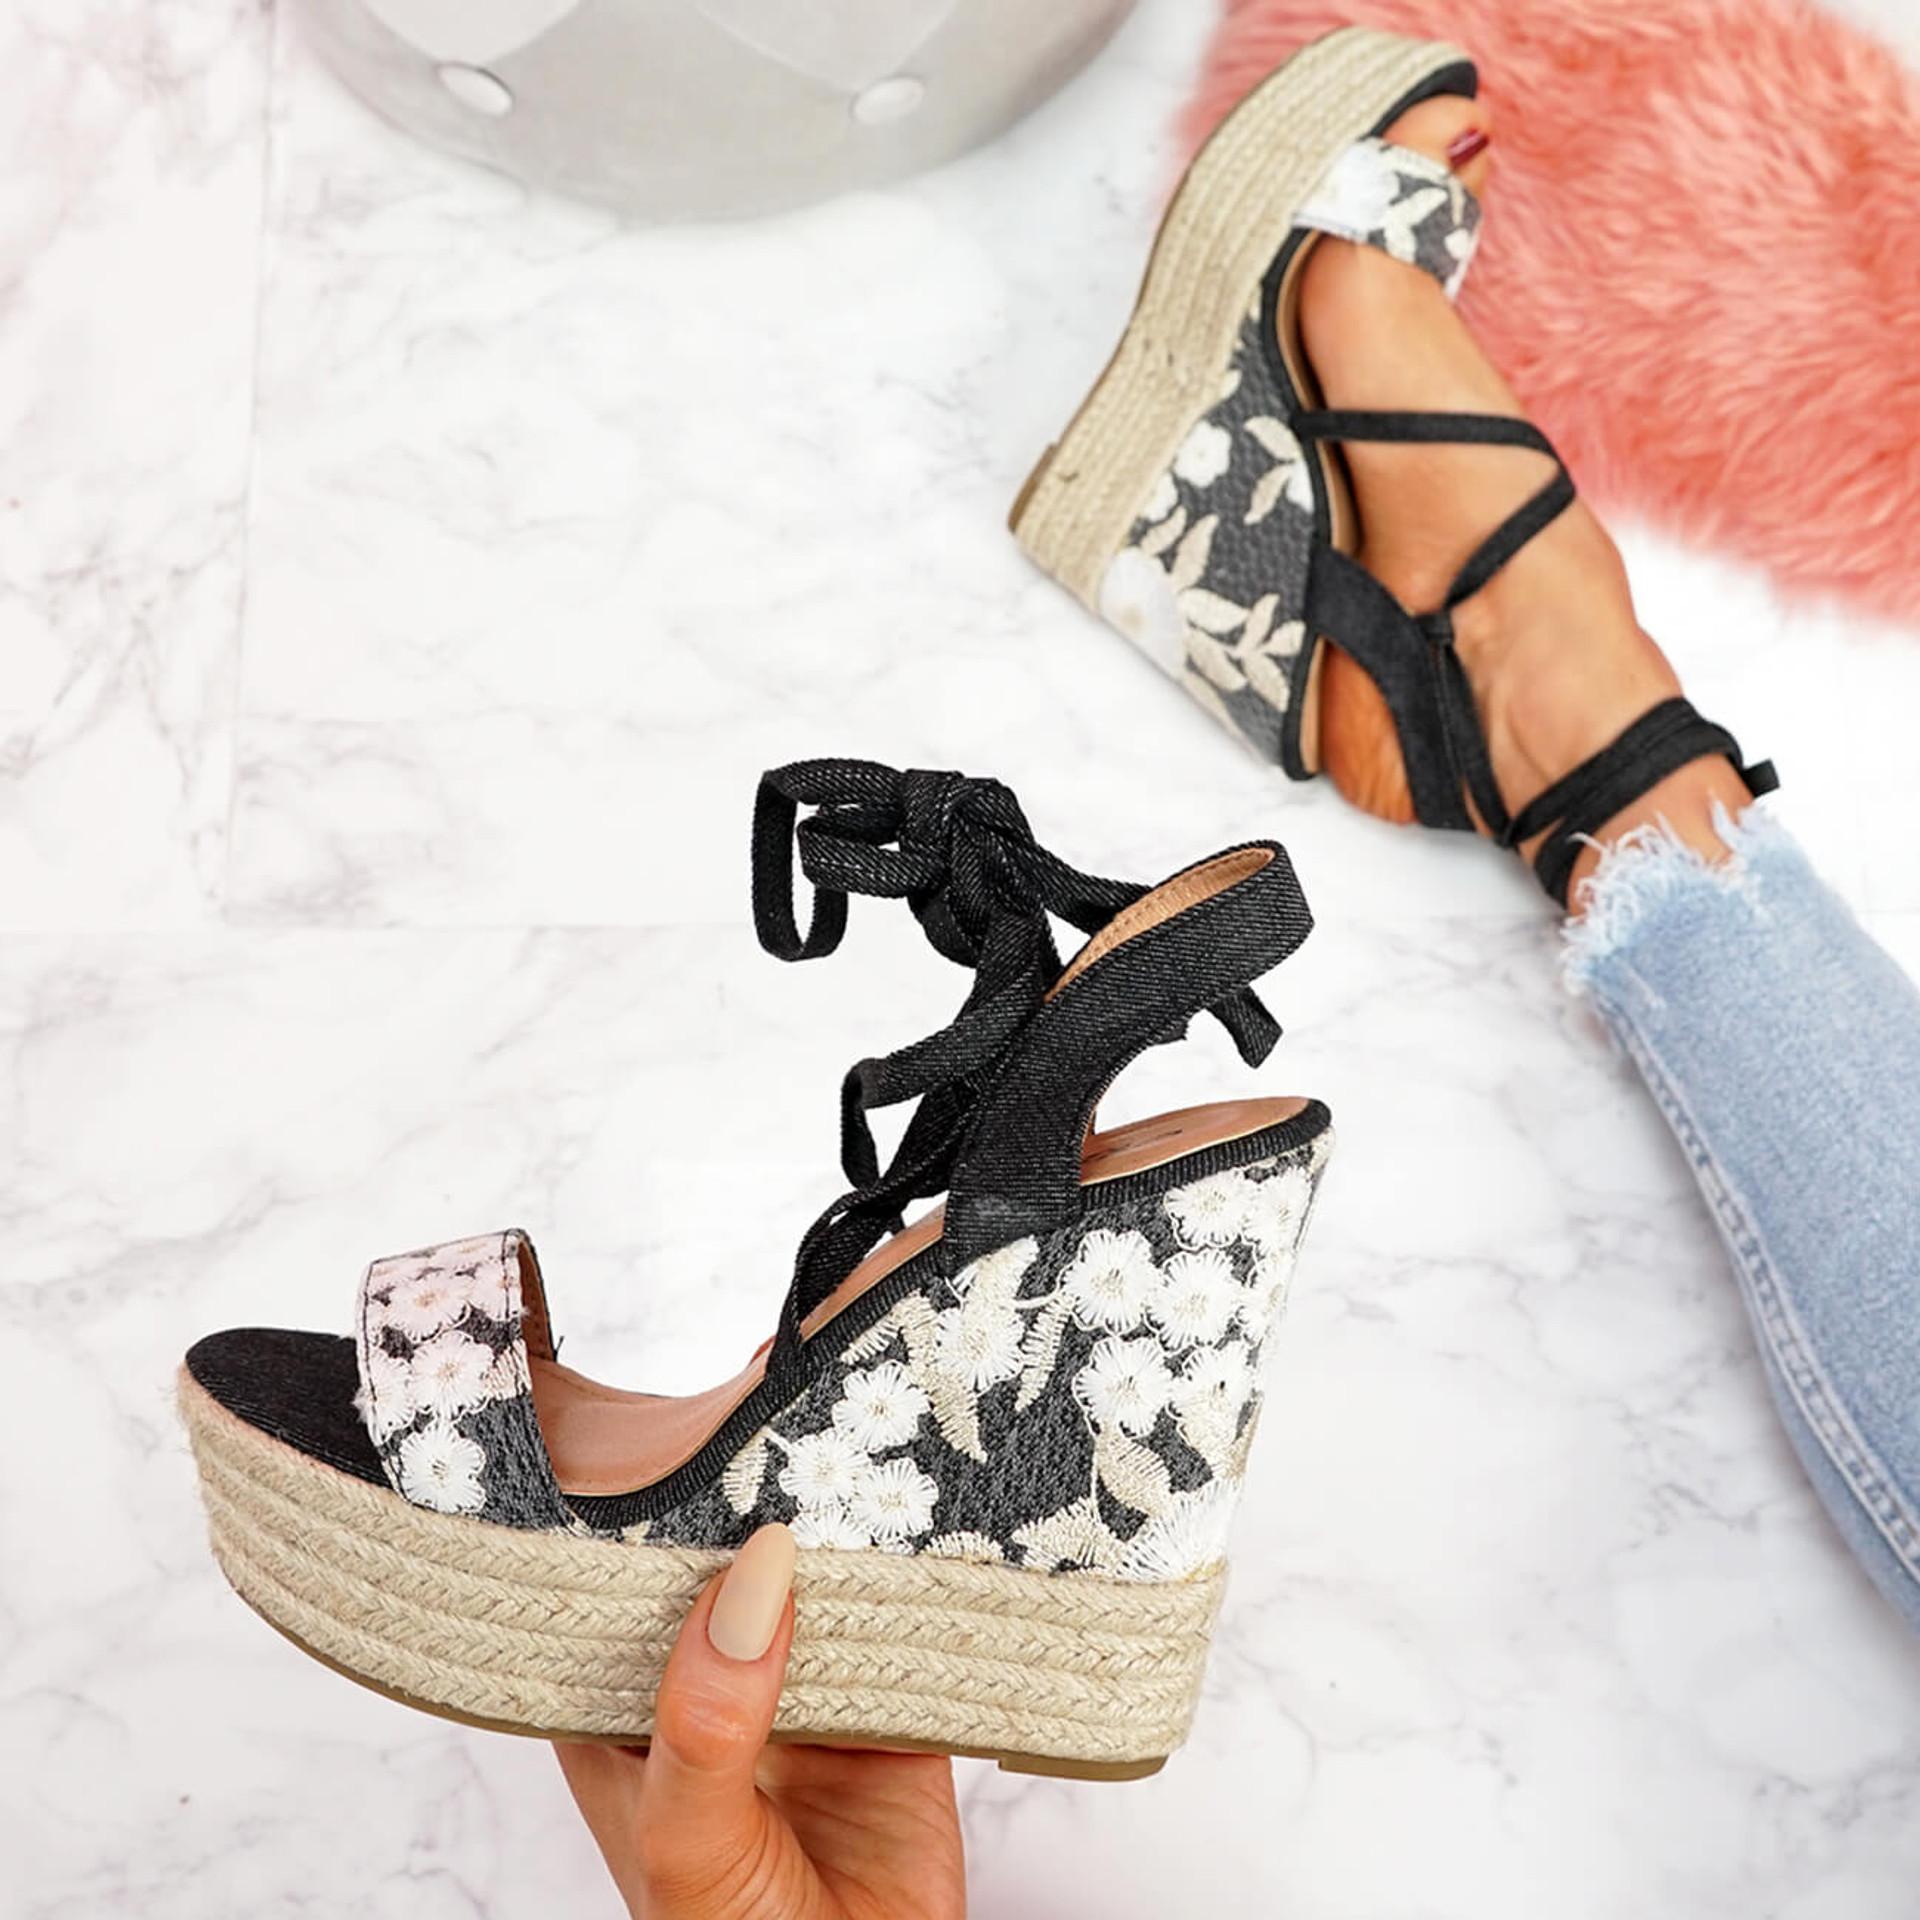 womens ladies high heels wedge platform espadrille sandals peep toe lace up summer women shoes size uk 3 4 5 6 7 8